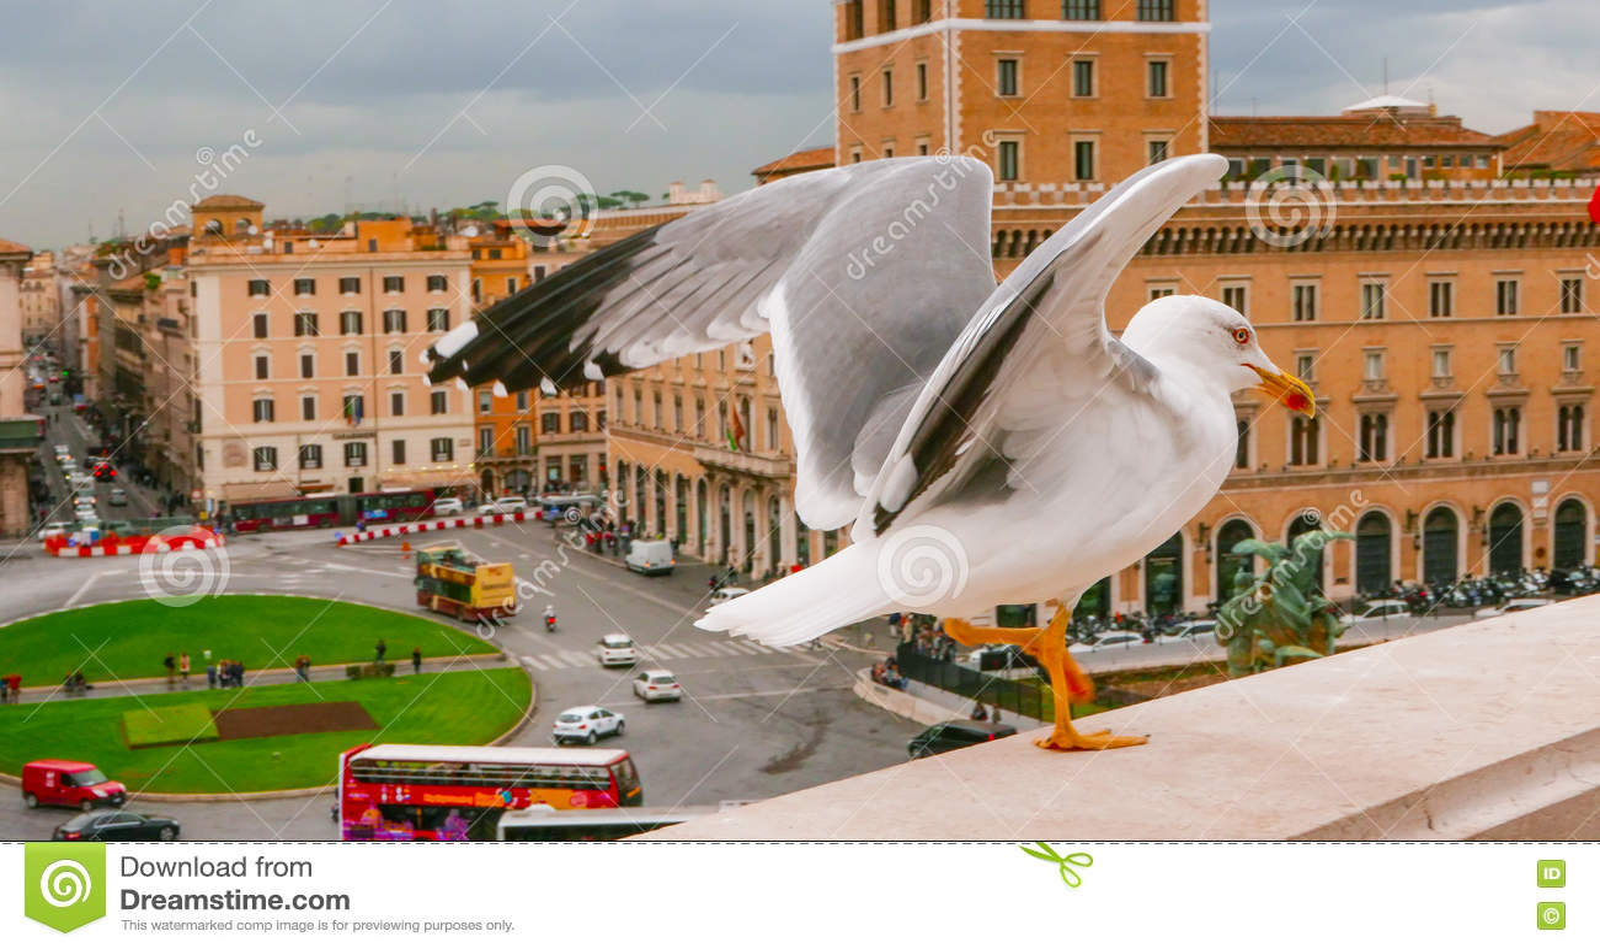 Чайка на стене национального монумента в Риме